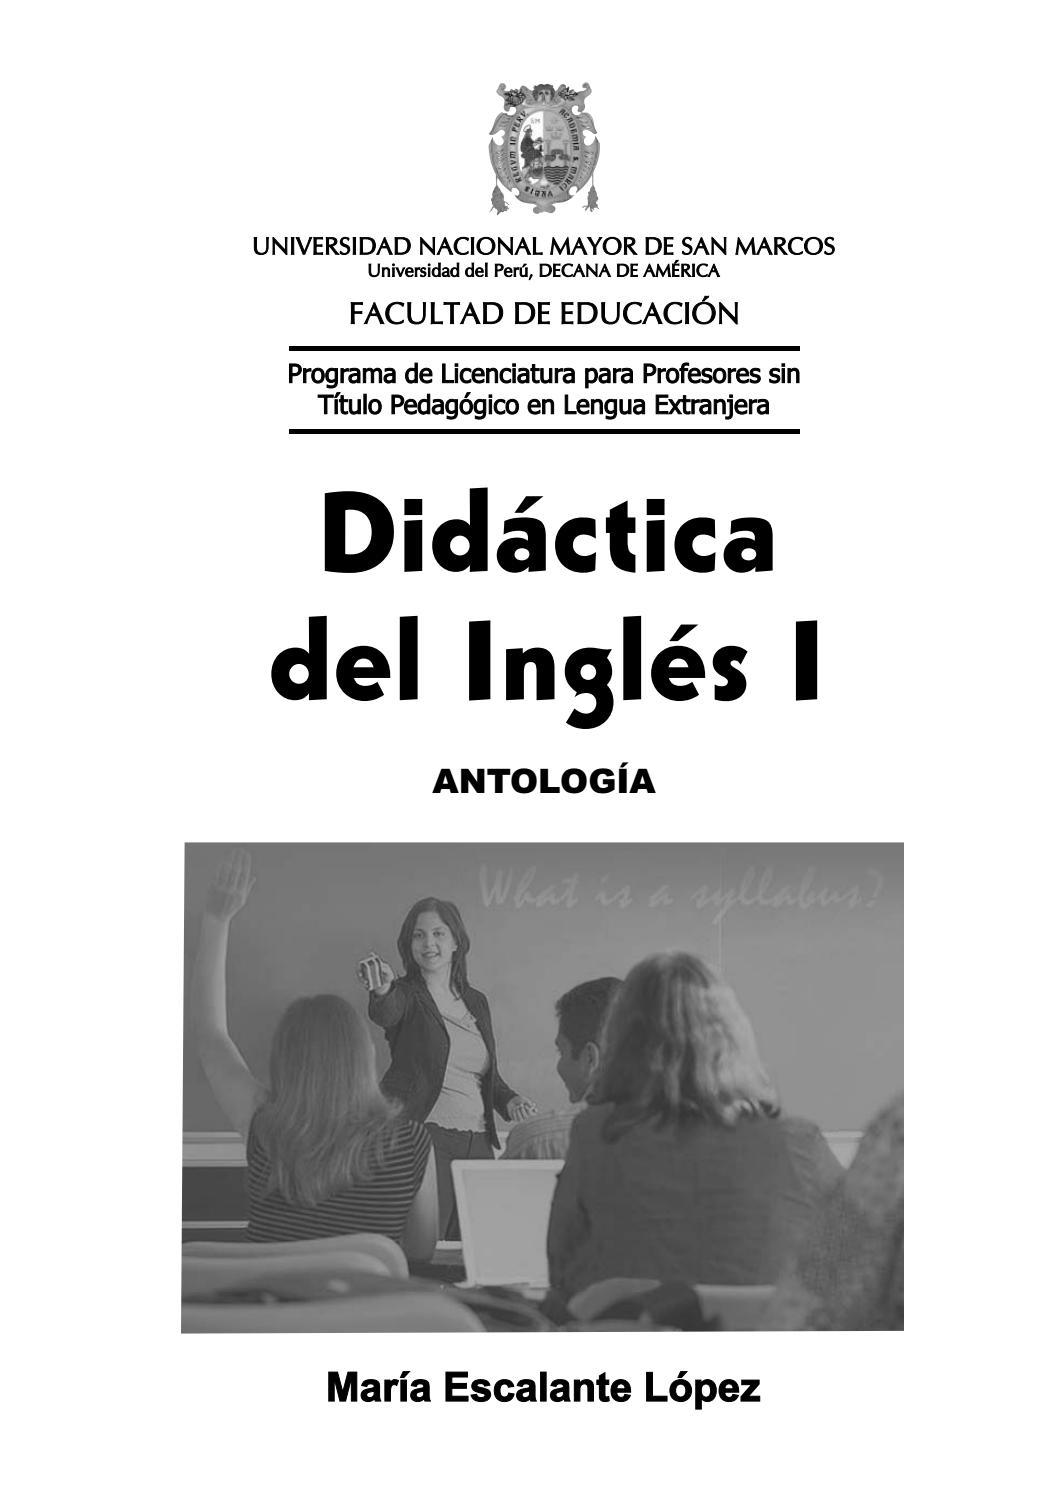 Didáctica del inglés I by UNMSM-PROLEX - issuu